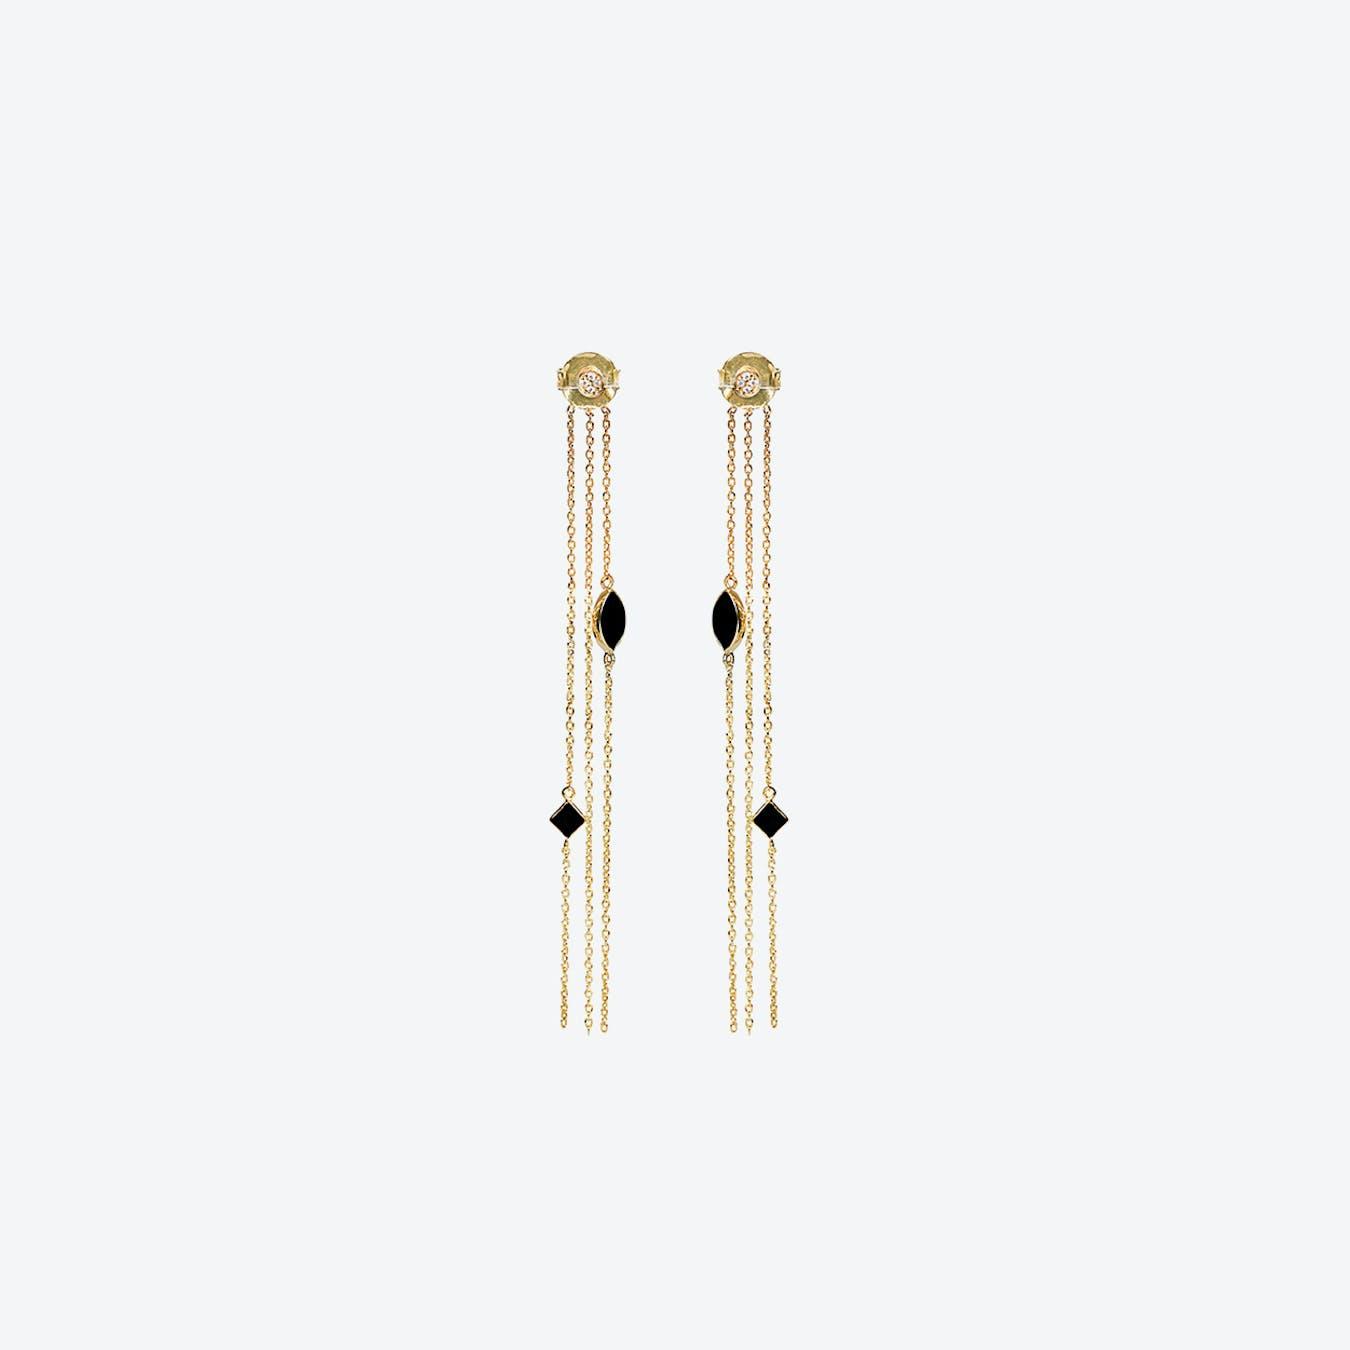 Shayan Earrings - Textured Onyx